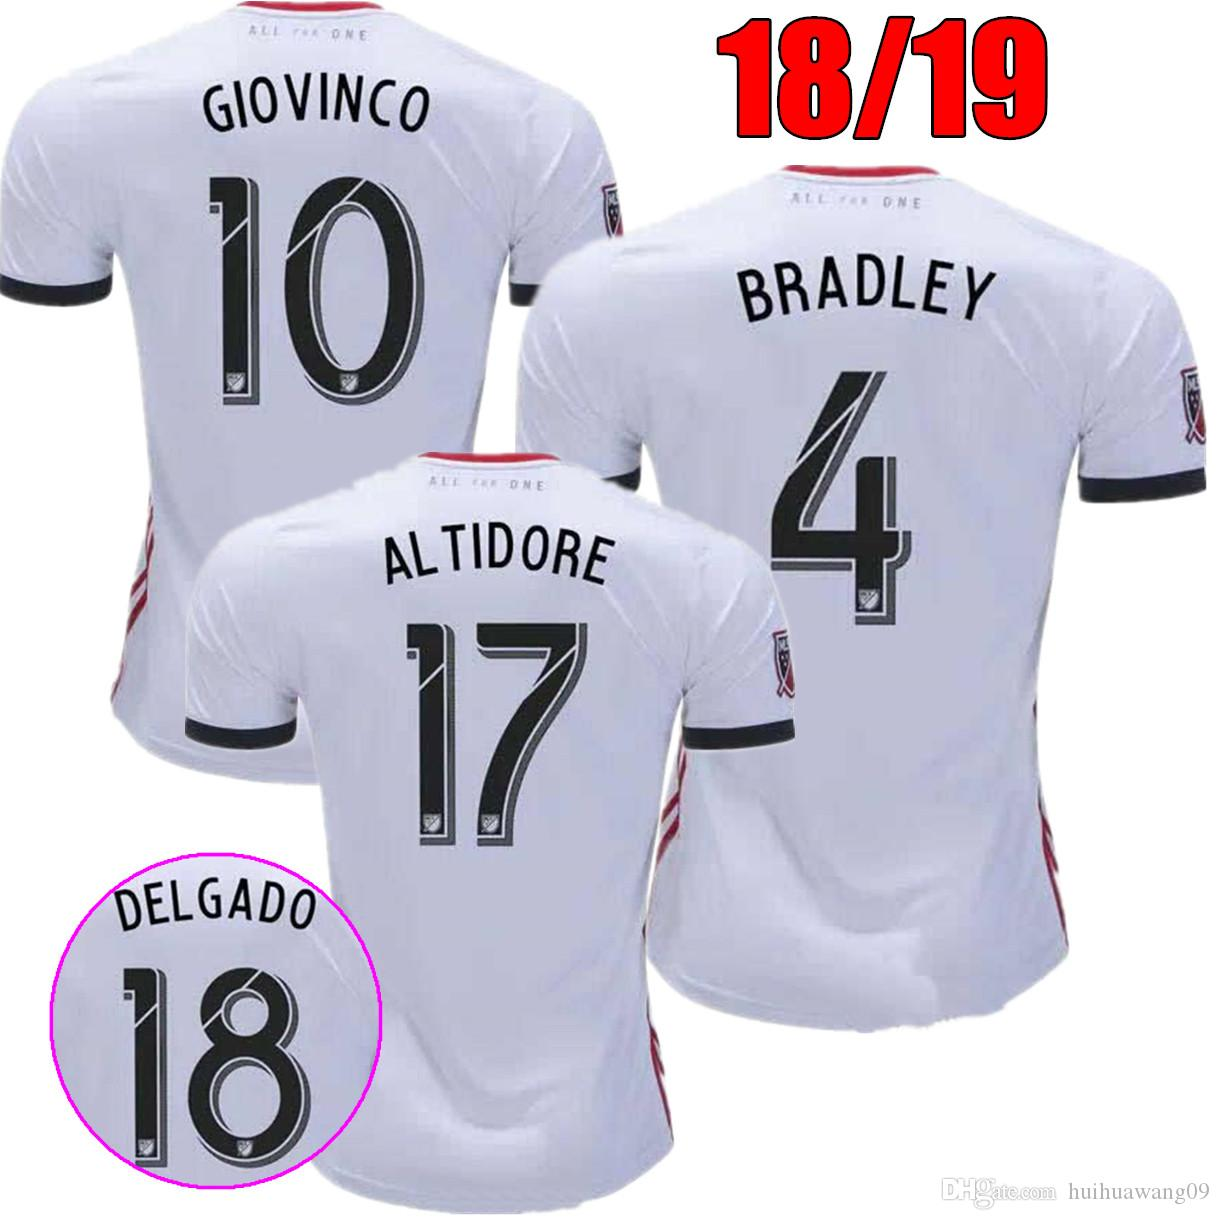 8f9f6615ab5 2019 2018 2019 Toronto Away Soccer Jersey 18/19 #10 GIOVINCO #4 BRADLEY 17  ALTIDORE White Soccer Shirt Customized MLS Kit Football Uniform Shirts From  ...